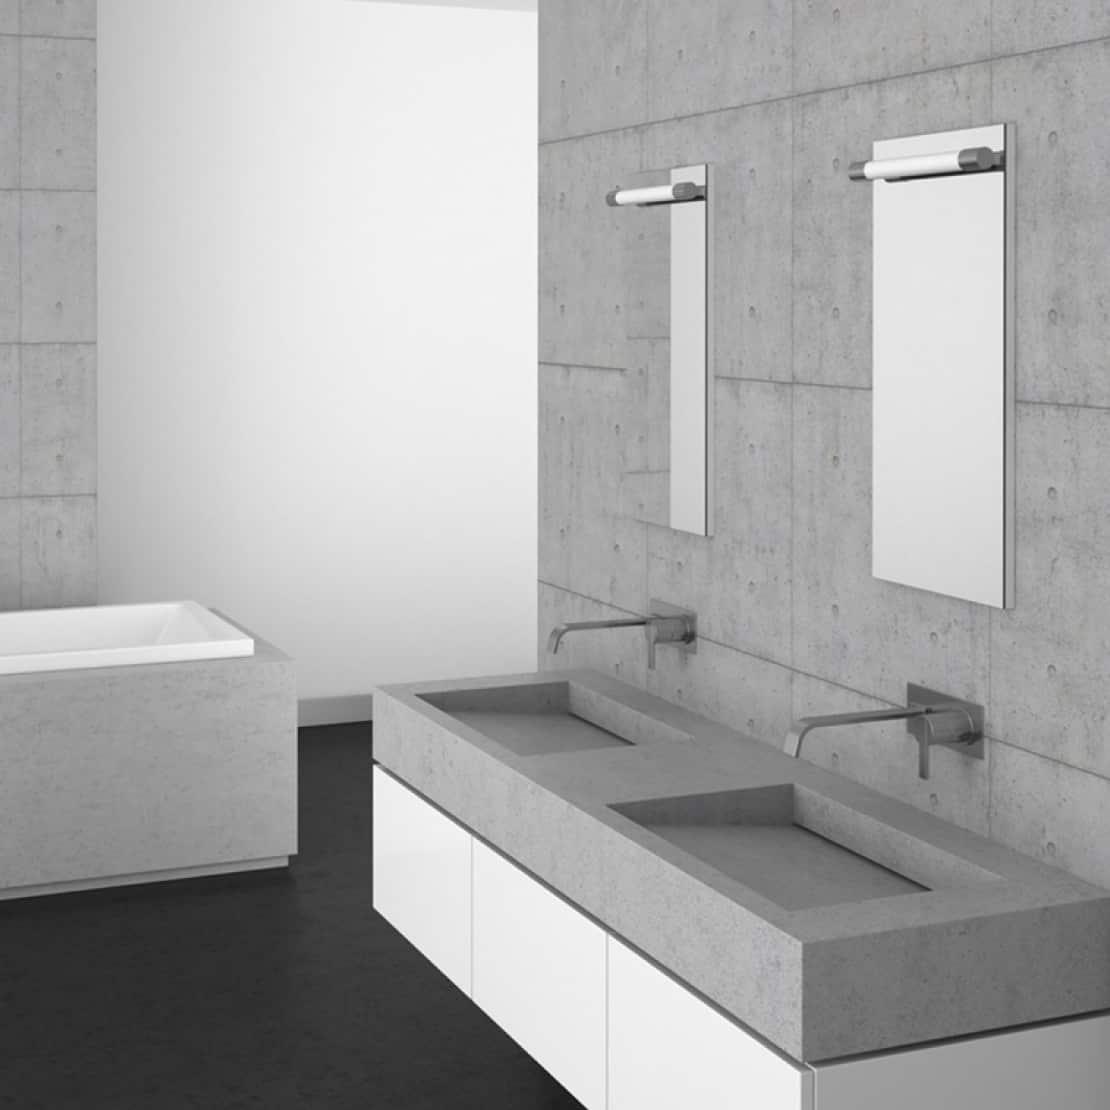 polished concrete sinks and concrete basins